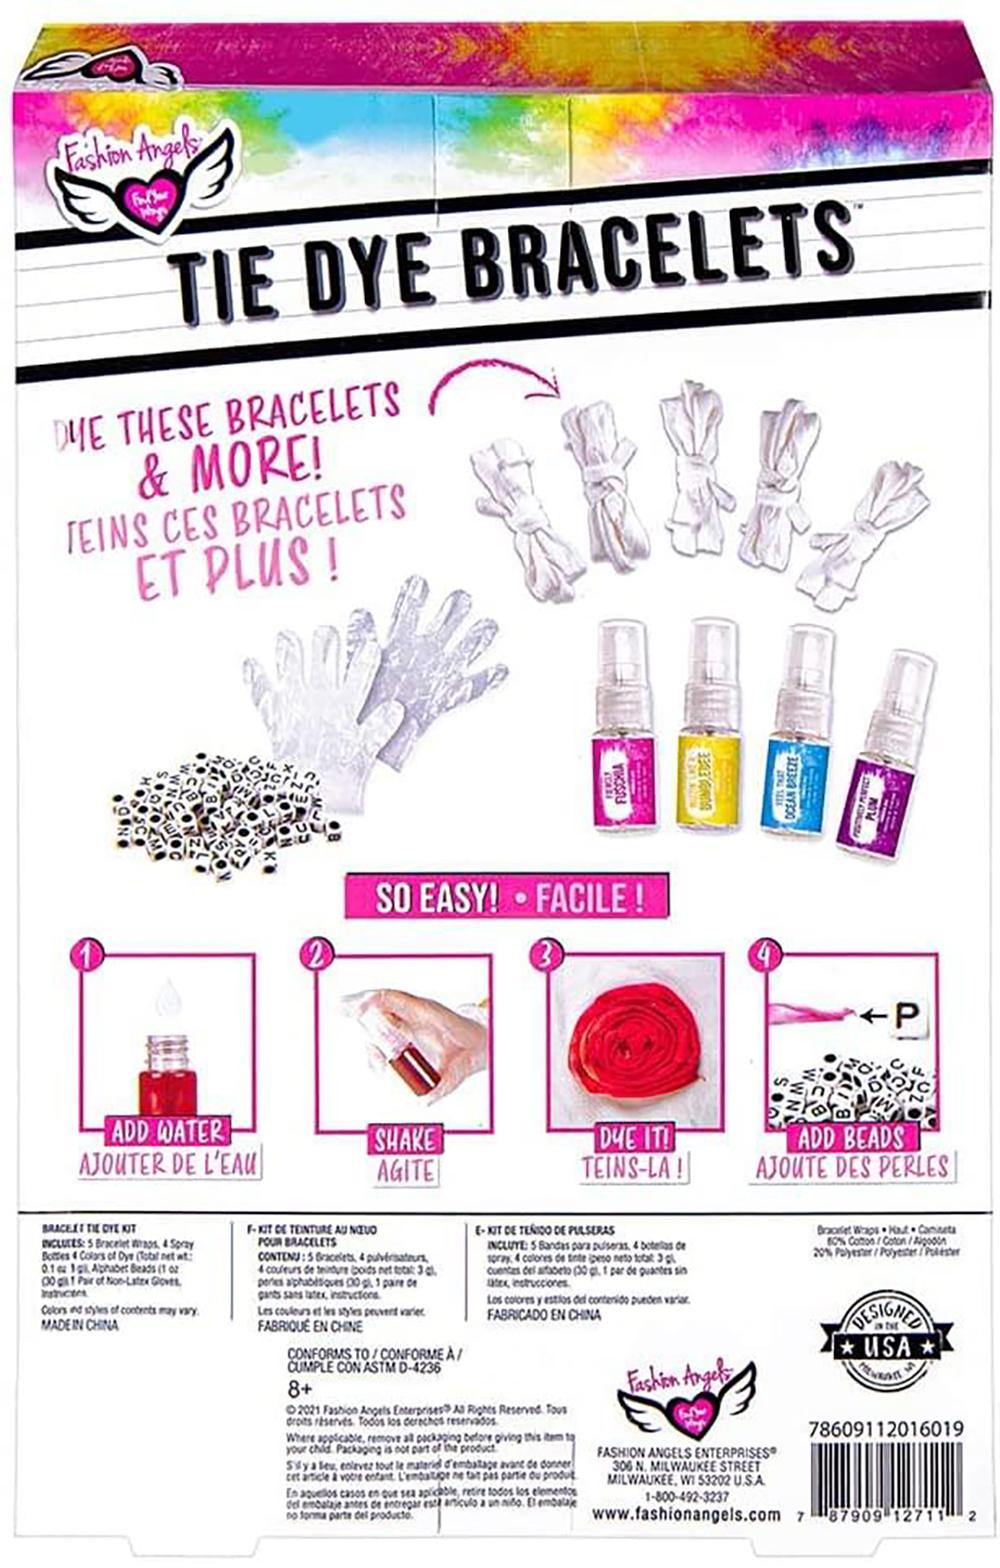 Fashion Angels - Tie Dye Bracelet Kit